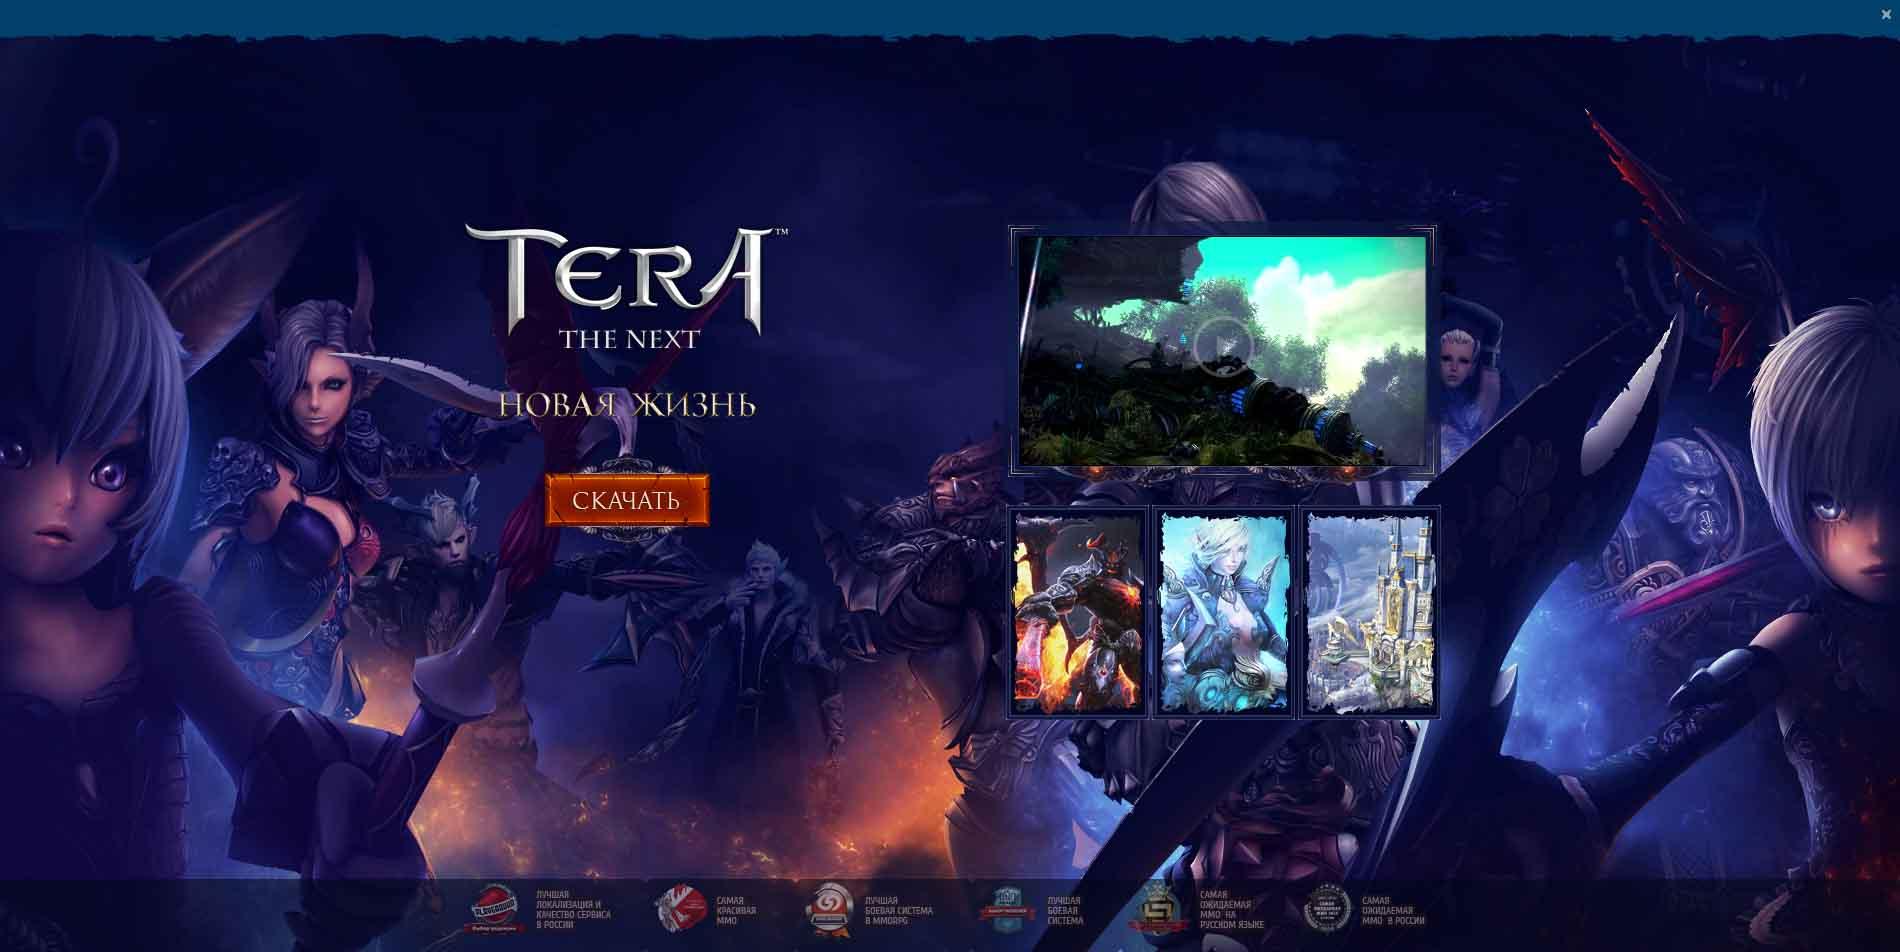 Тера онлайн - лучшая онлайн игра